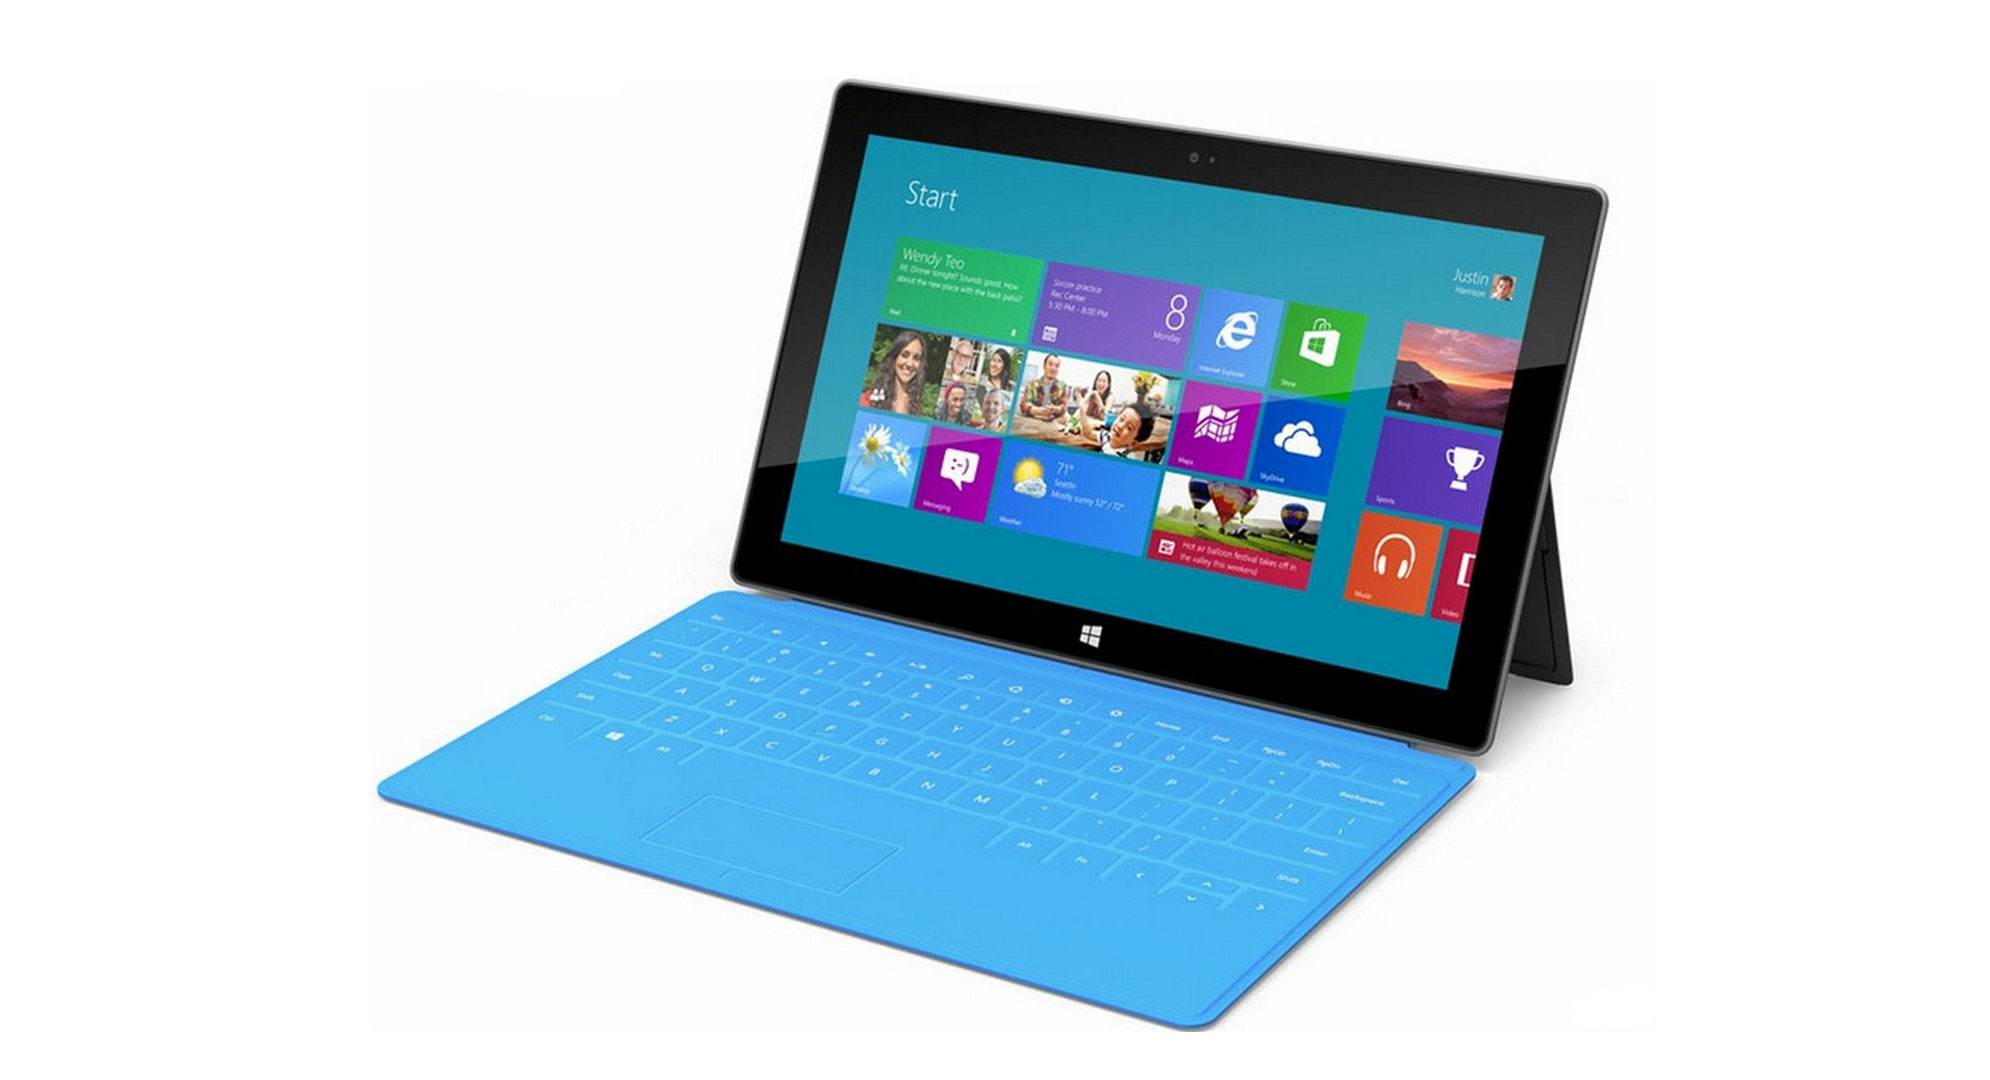 Tablet Surface Windows 8 - Tablet Surface Windows 8